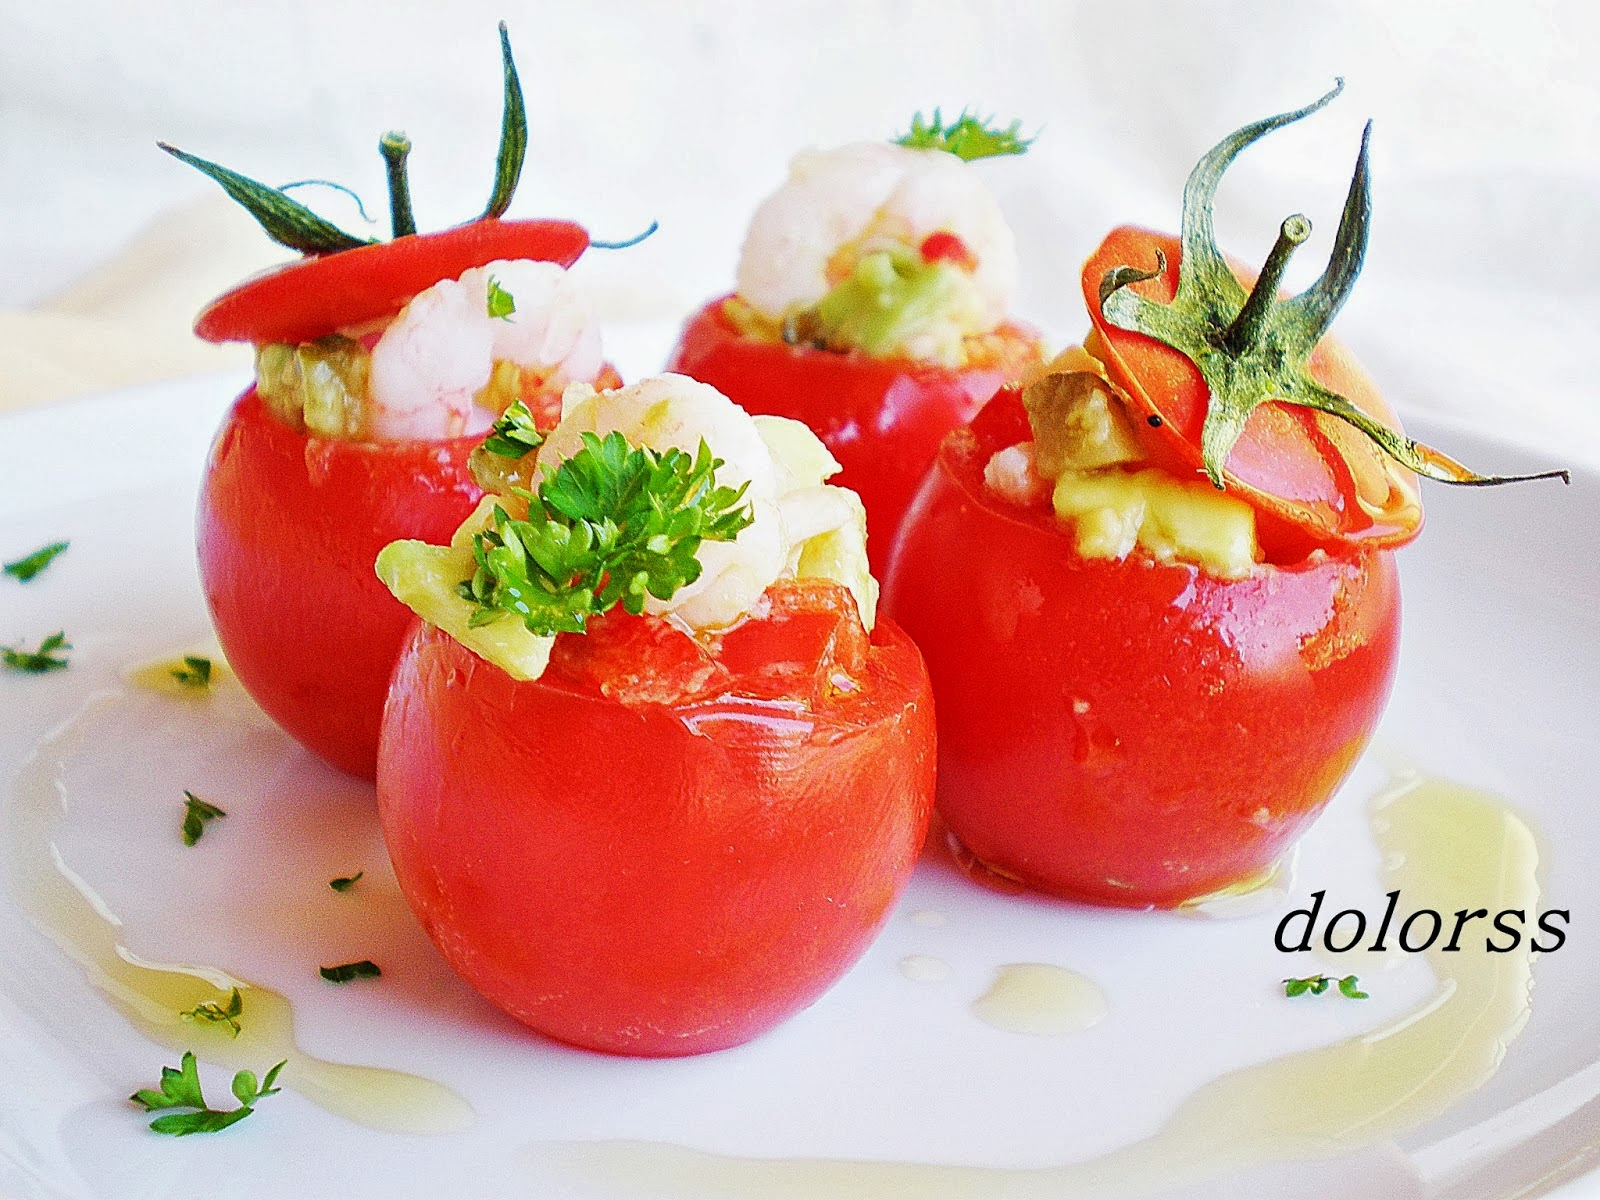 http://blogdecuina.blogspot.com.es/2013/07/tomates-mini-rellenos-de-camarones-y.html